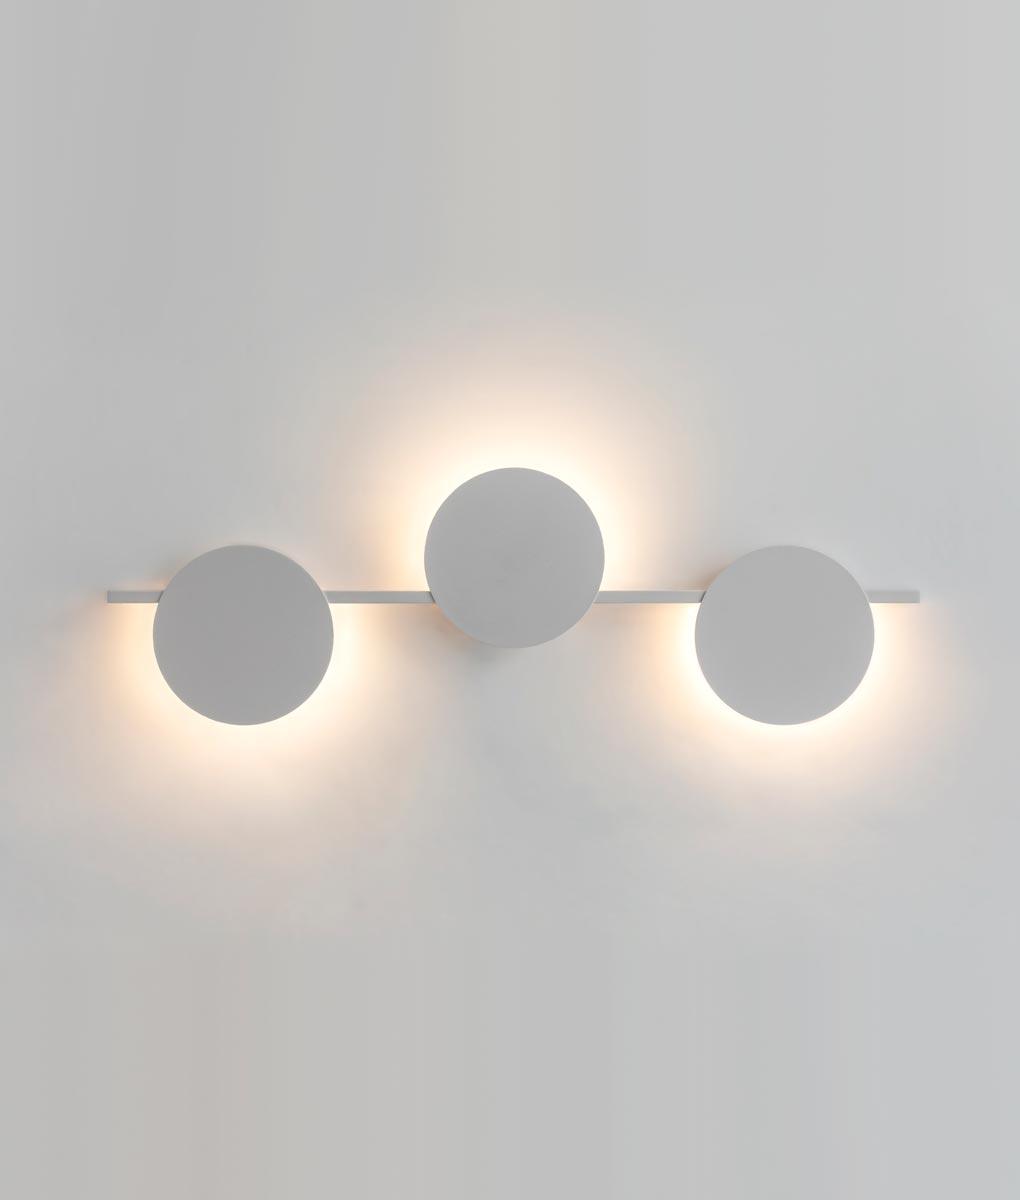 Aplique blanco tres luces 24W ERIS LED